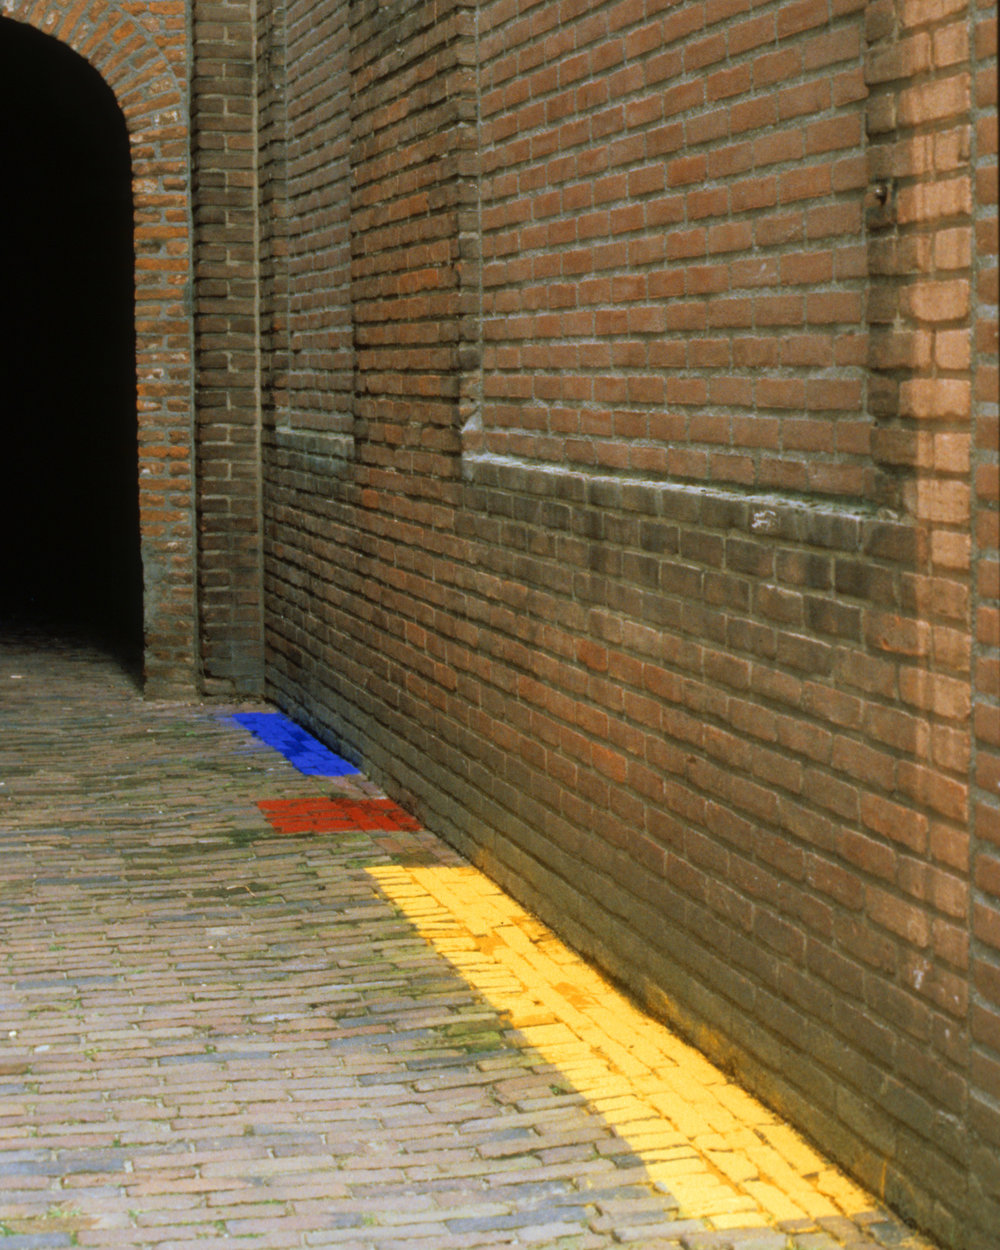 Installation, s'Hertogenbosch, NL, 1997  Dimensions variable, Oxides on brick